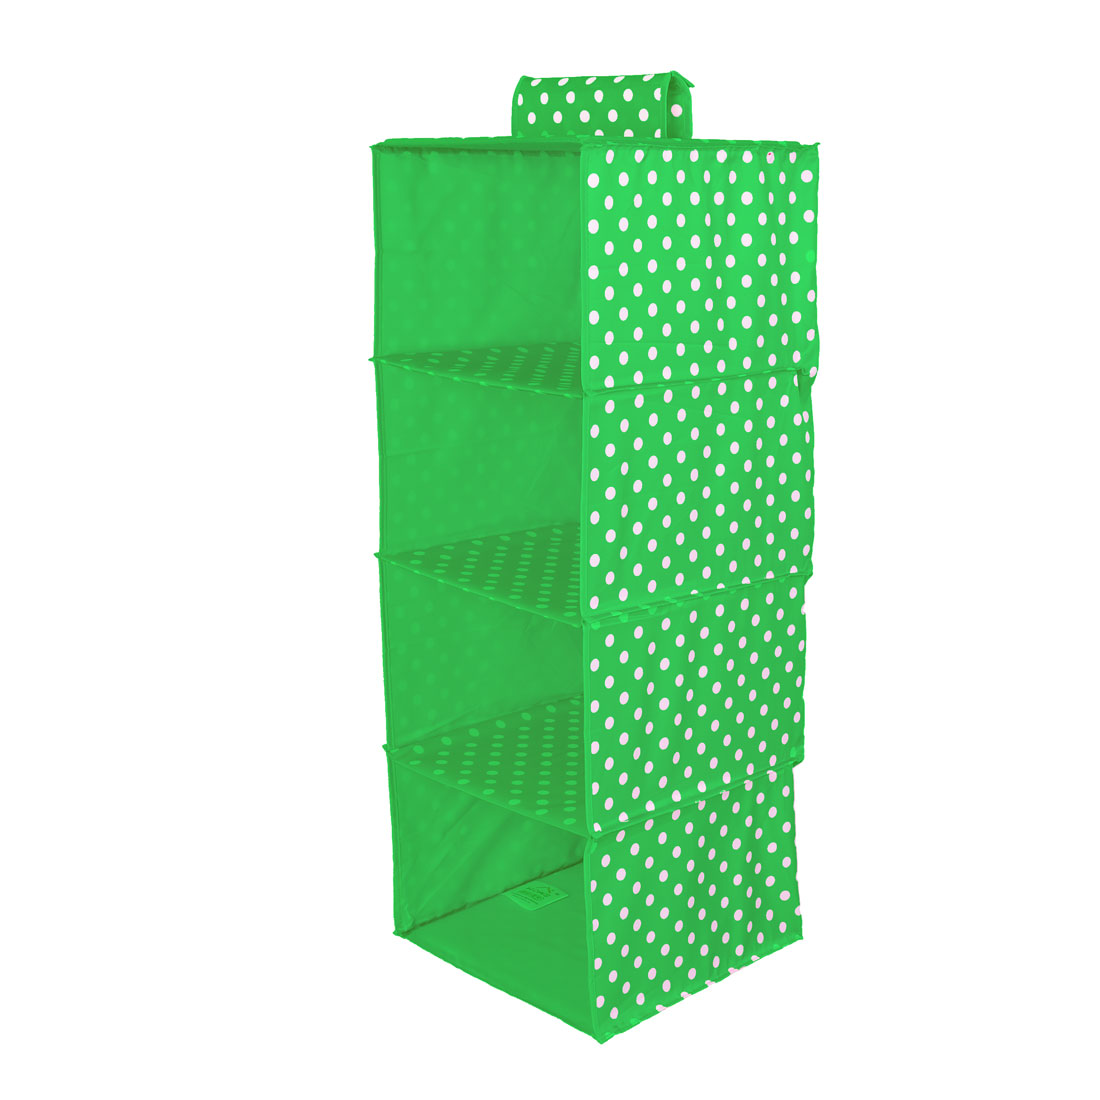 Foldable 4 Compartments Dots Pattern Clothes Underwear Organizer Storage Box Green